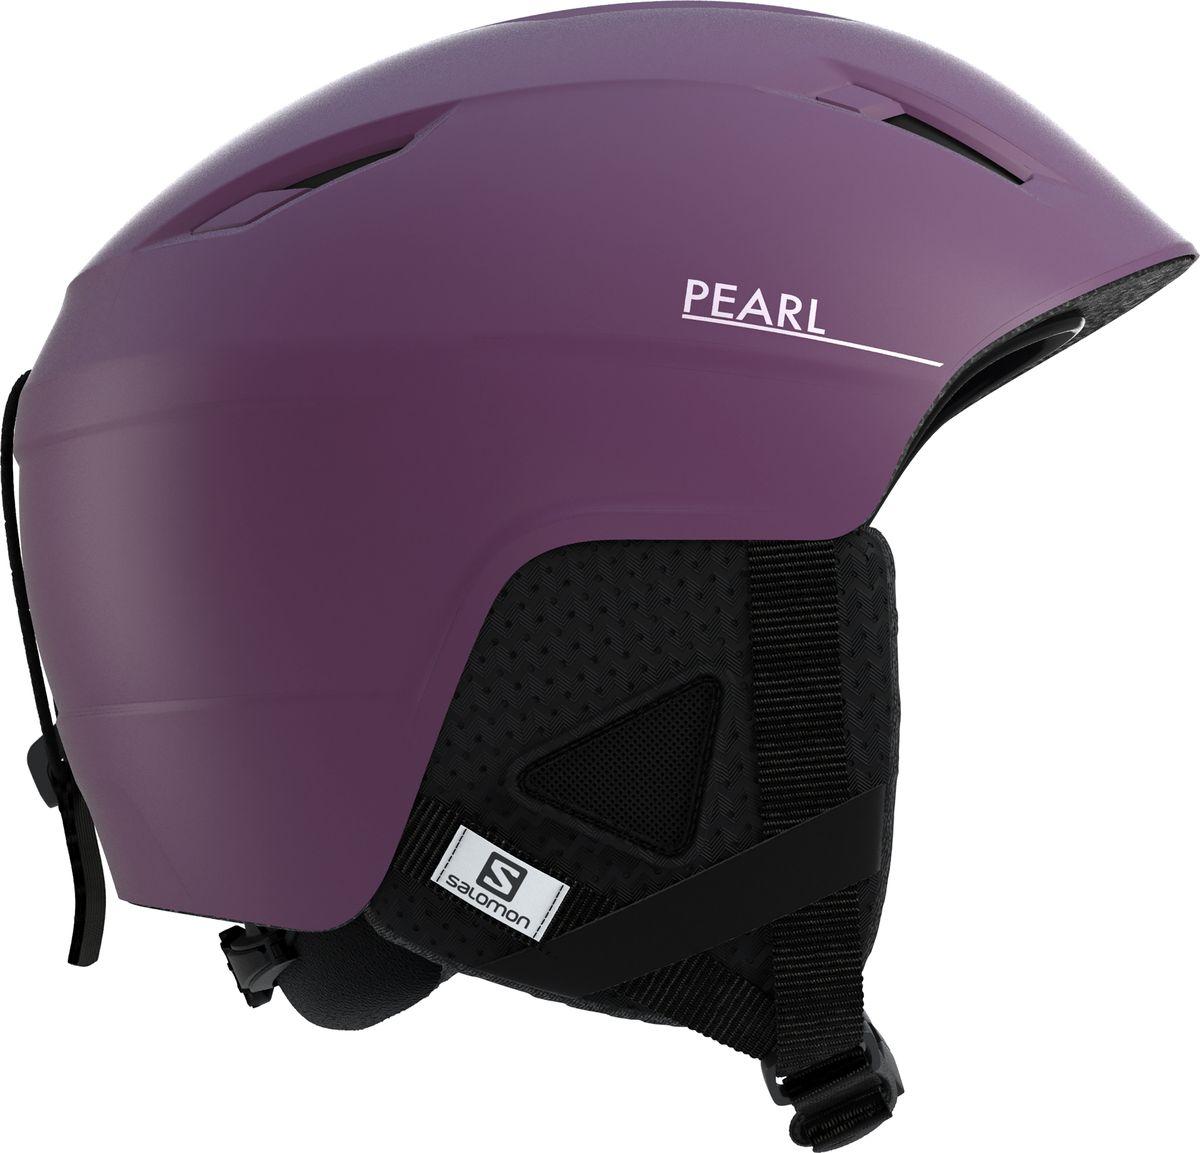 Шлем горнолыжный Salomon Pearl2+ Fig, цвет: фиолетовый. Размер M (56-59)